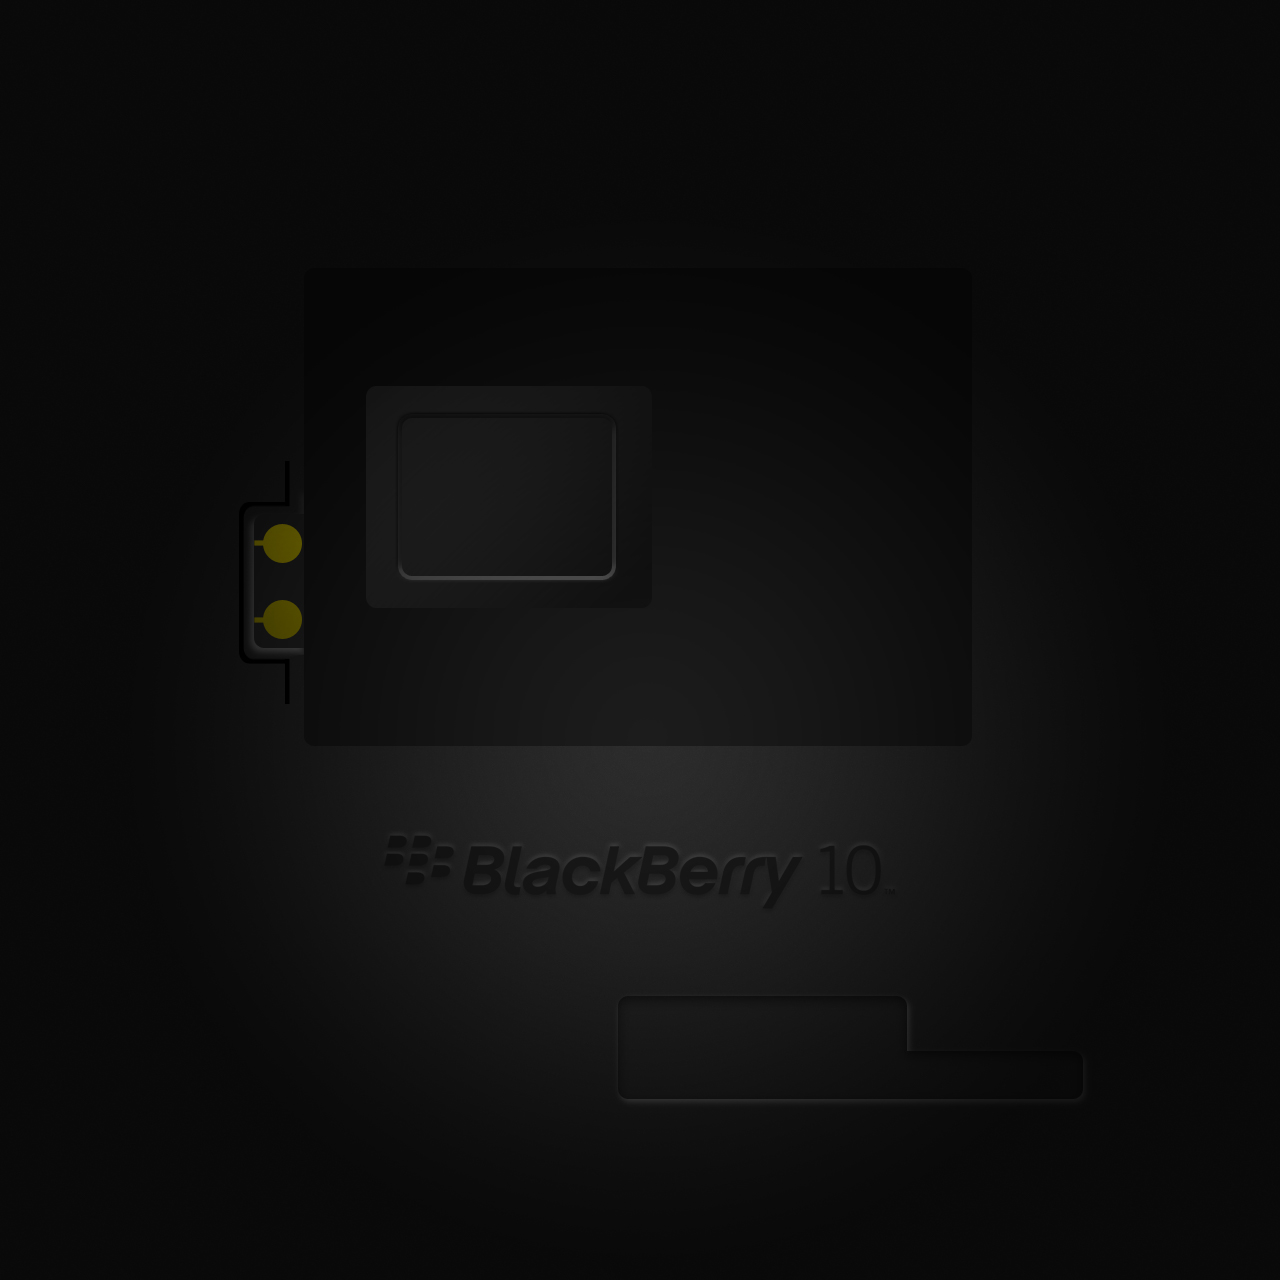 48 ] BlackBerry Q10 Wallpapers On WallpaperSafari